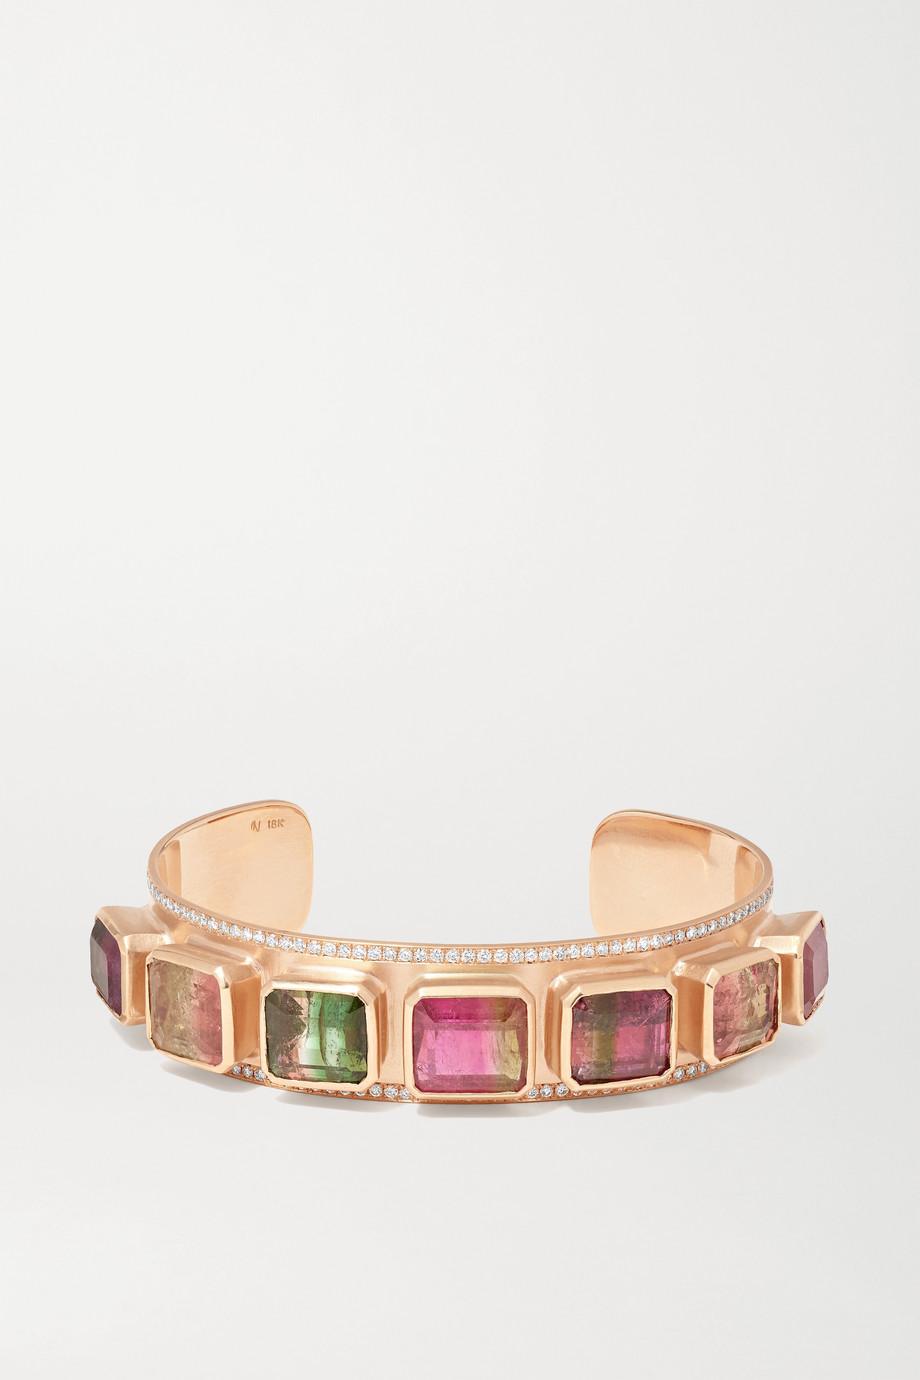 Irene Neuwirth Gemmy Gem 18-karat rose gold tourmaline and diamond cuff